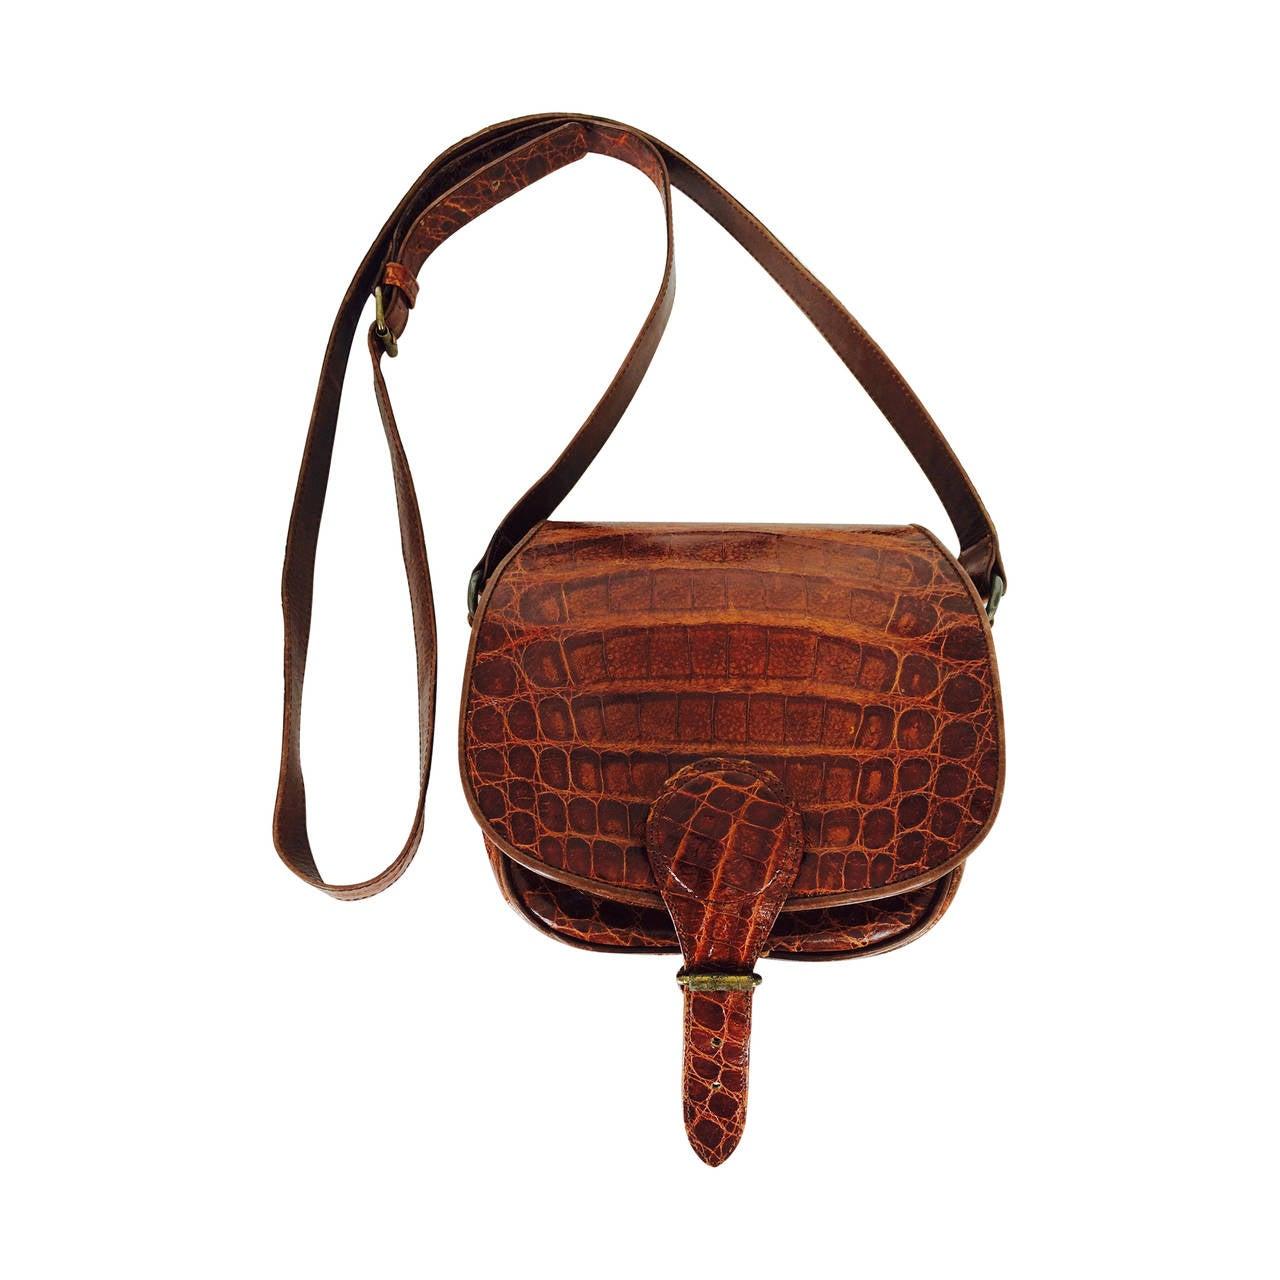 Saddle bag handbag cognac leather faux alligator Neiman Marcus 1980s